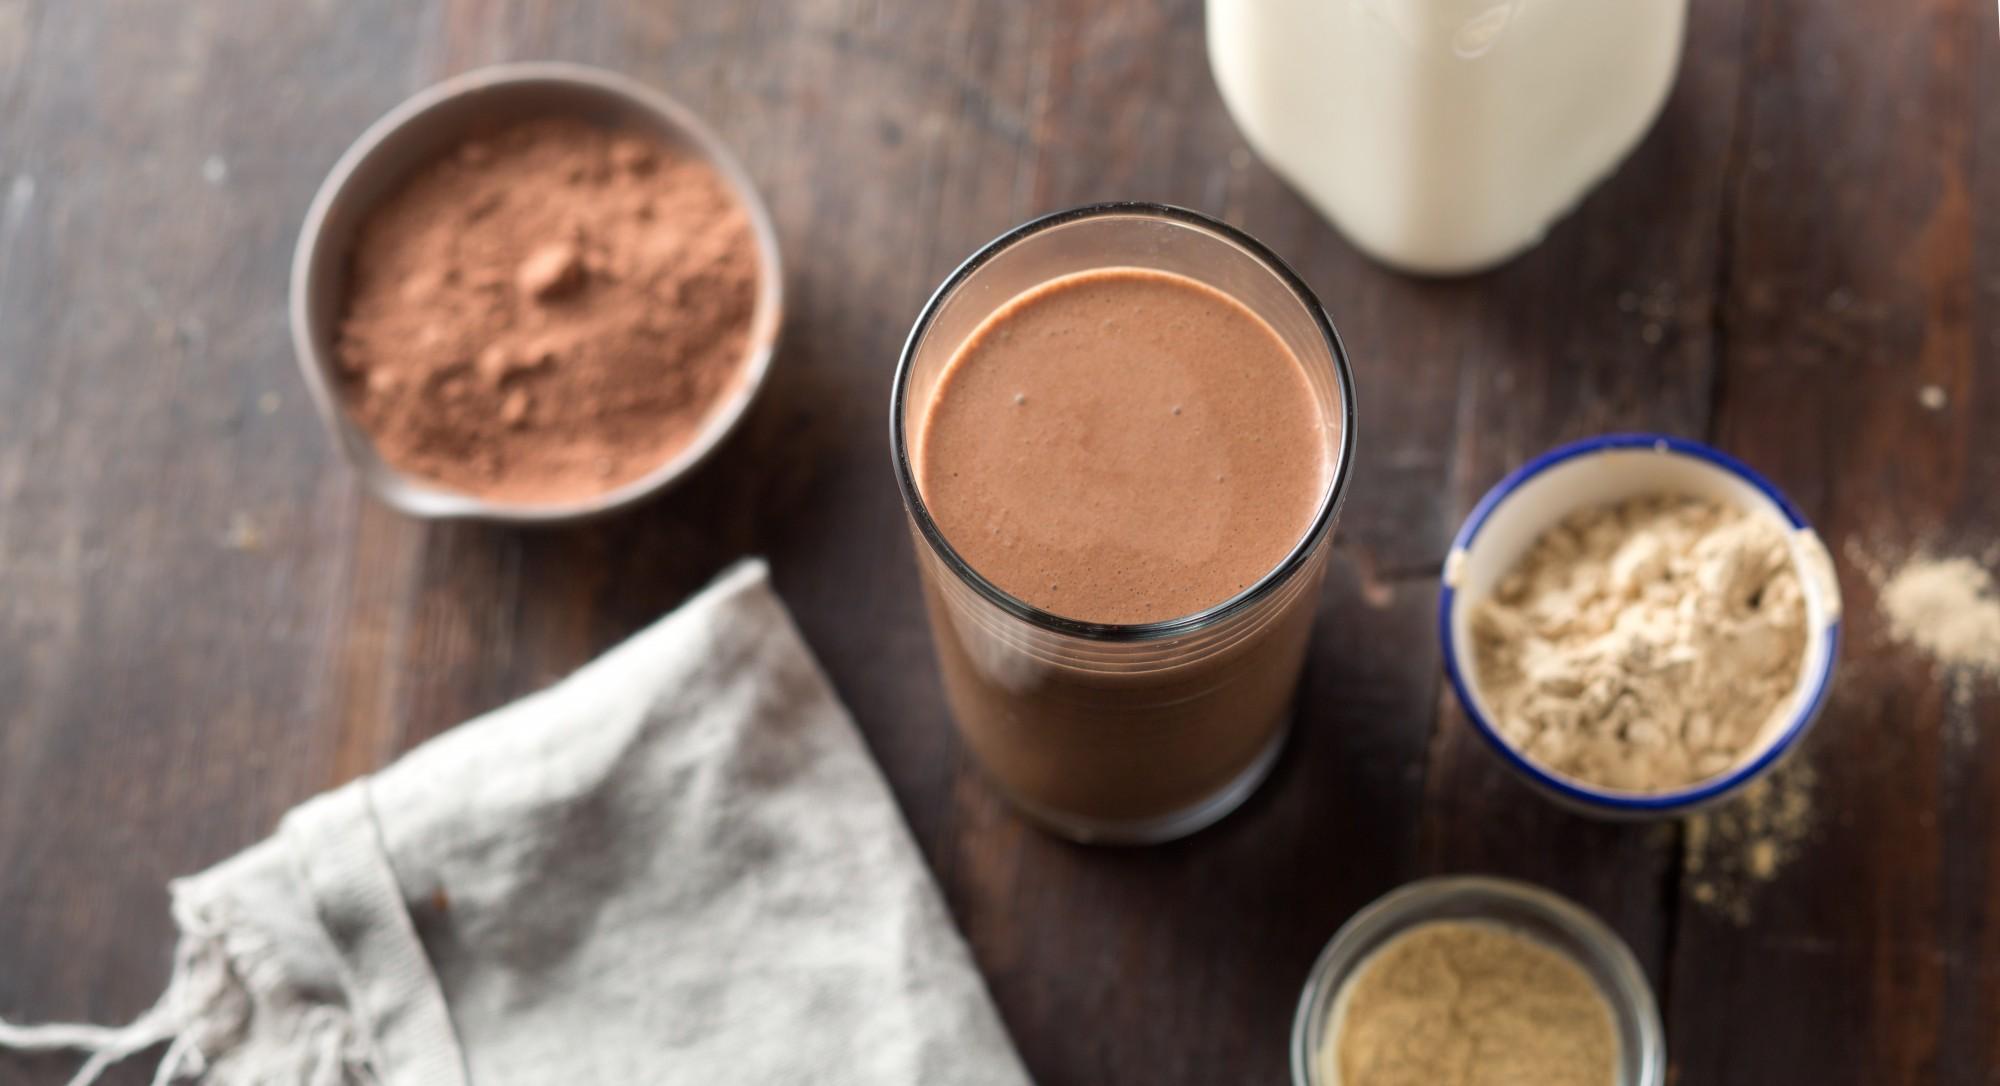 snacks con proteínas